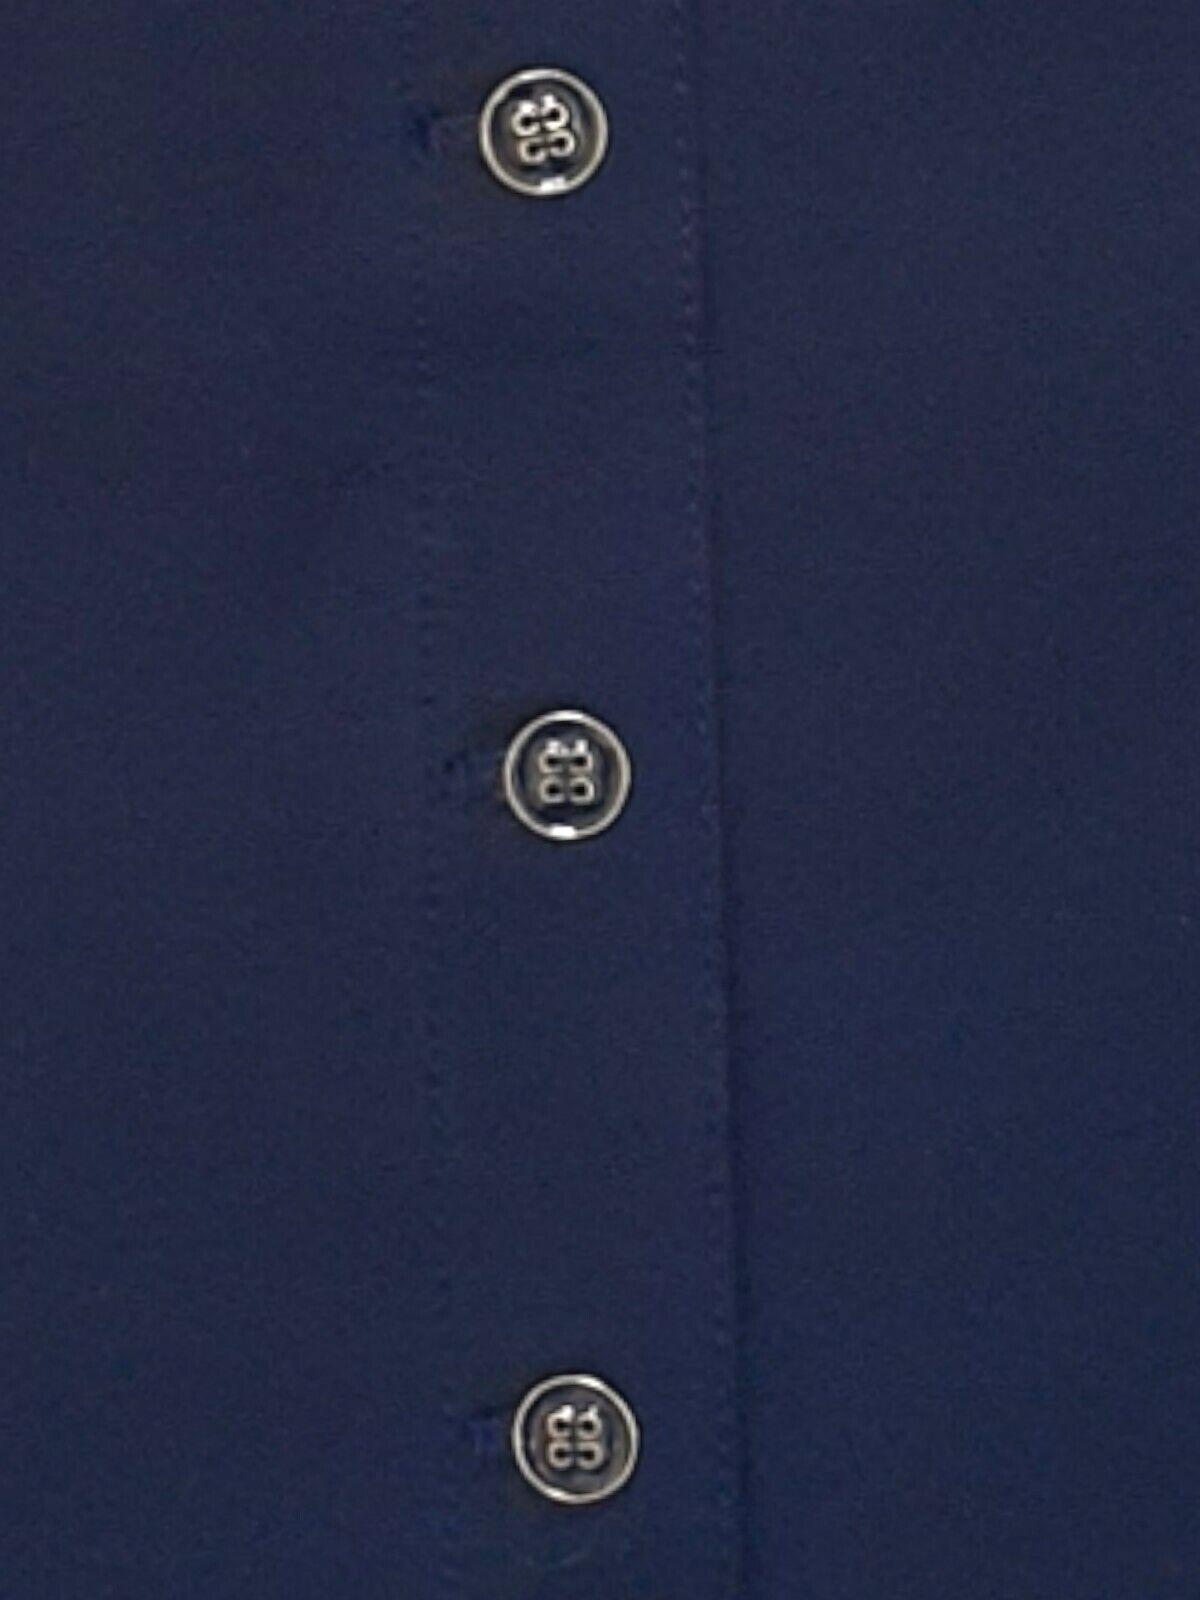 J McLaughlin Teal Button Front A Line Skirt Size 2 - image 6